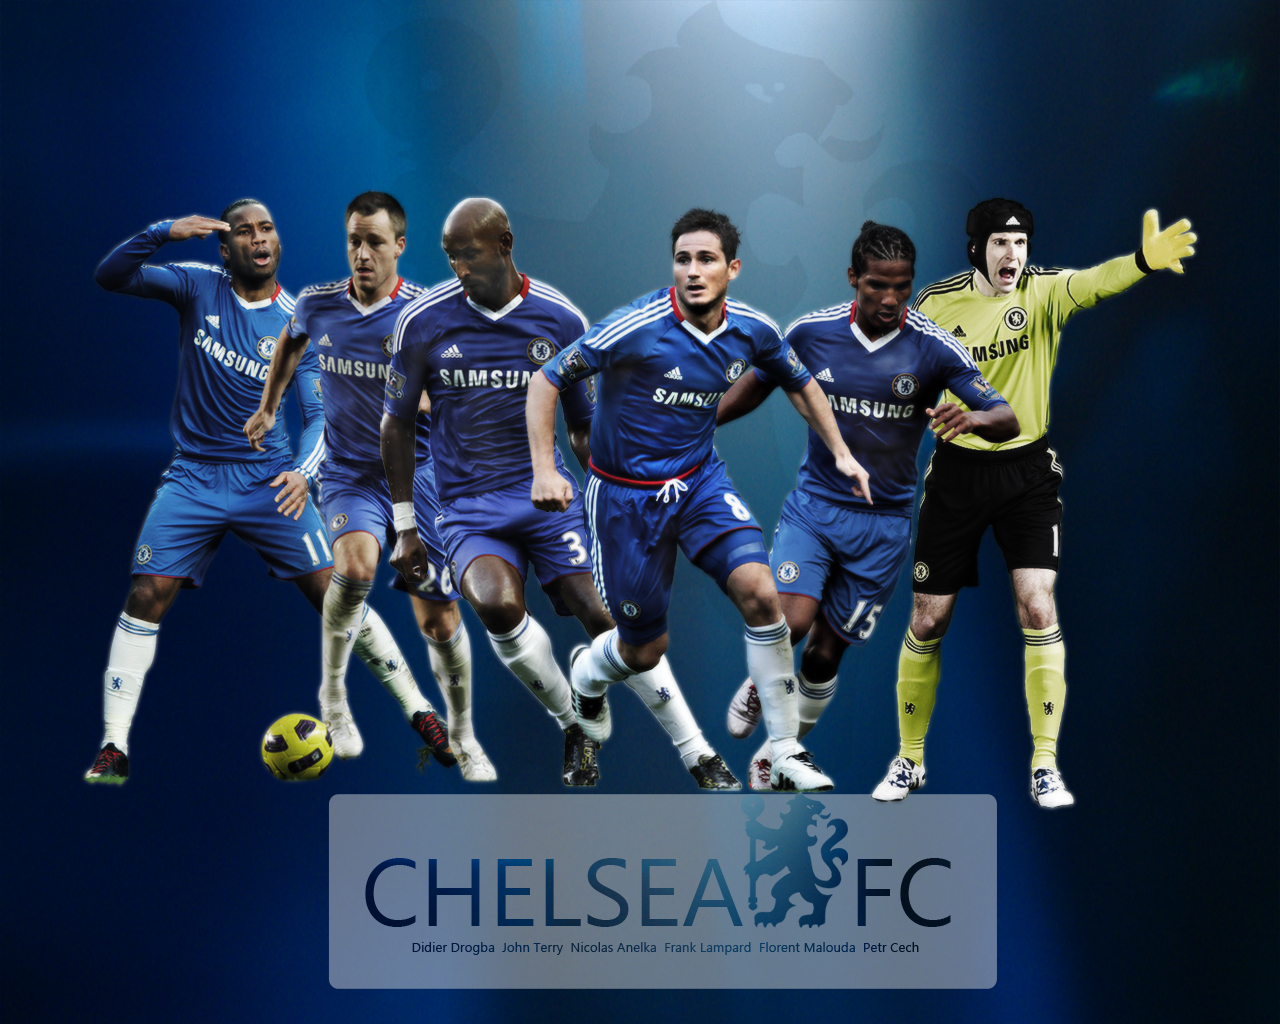 Chelsea Wallpaper Fc Soccer wallpaper Soccer Desktop Wallpapers 1280x1024